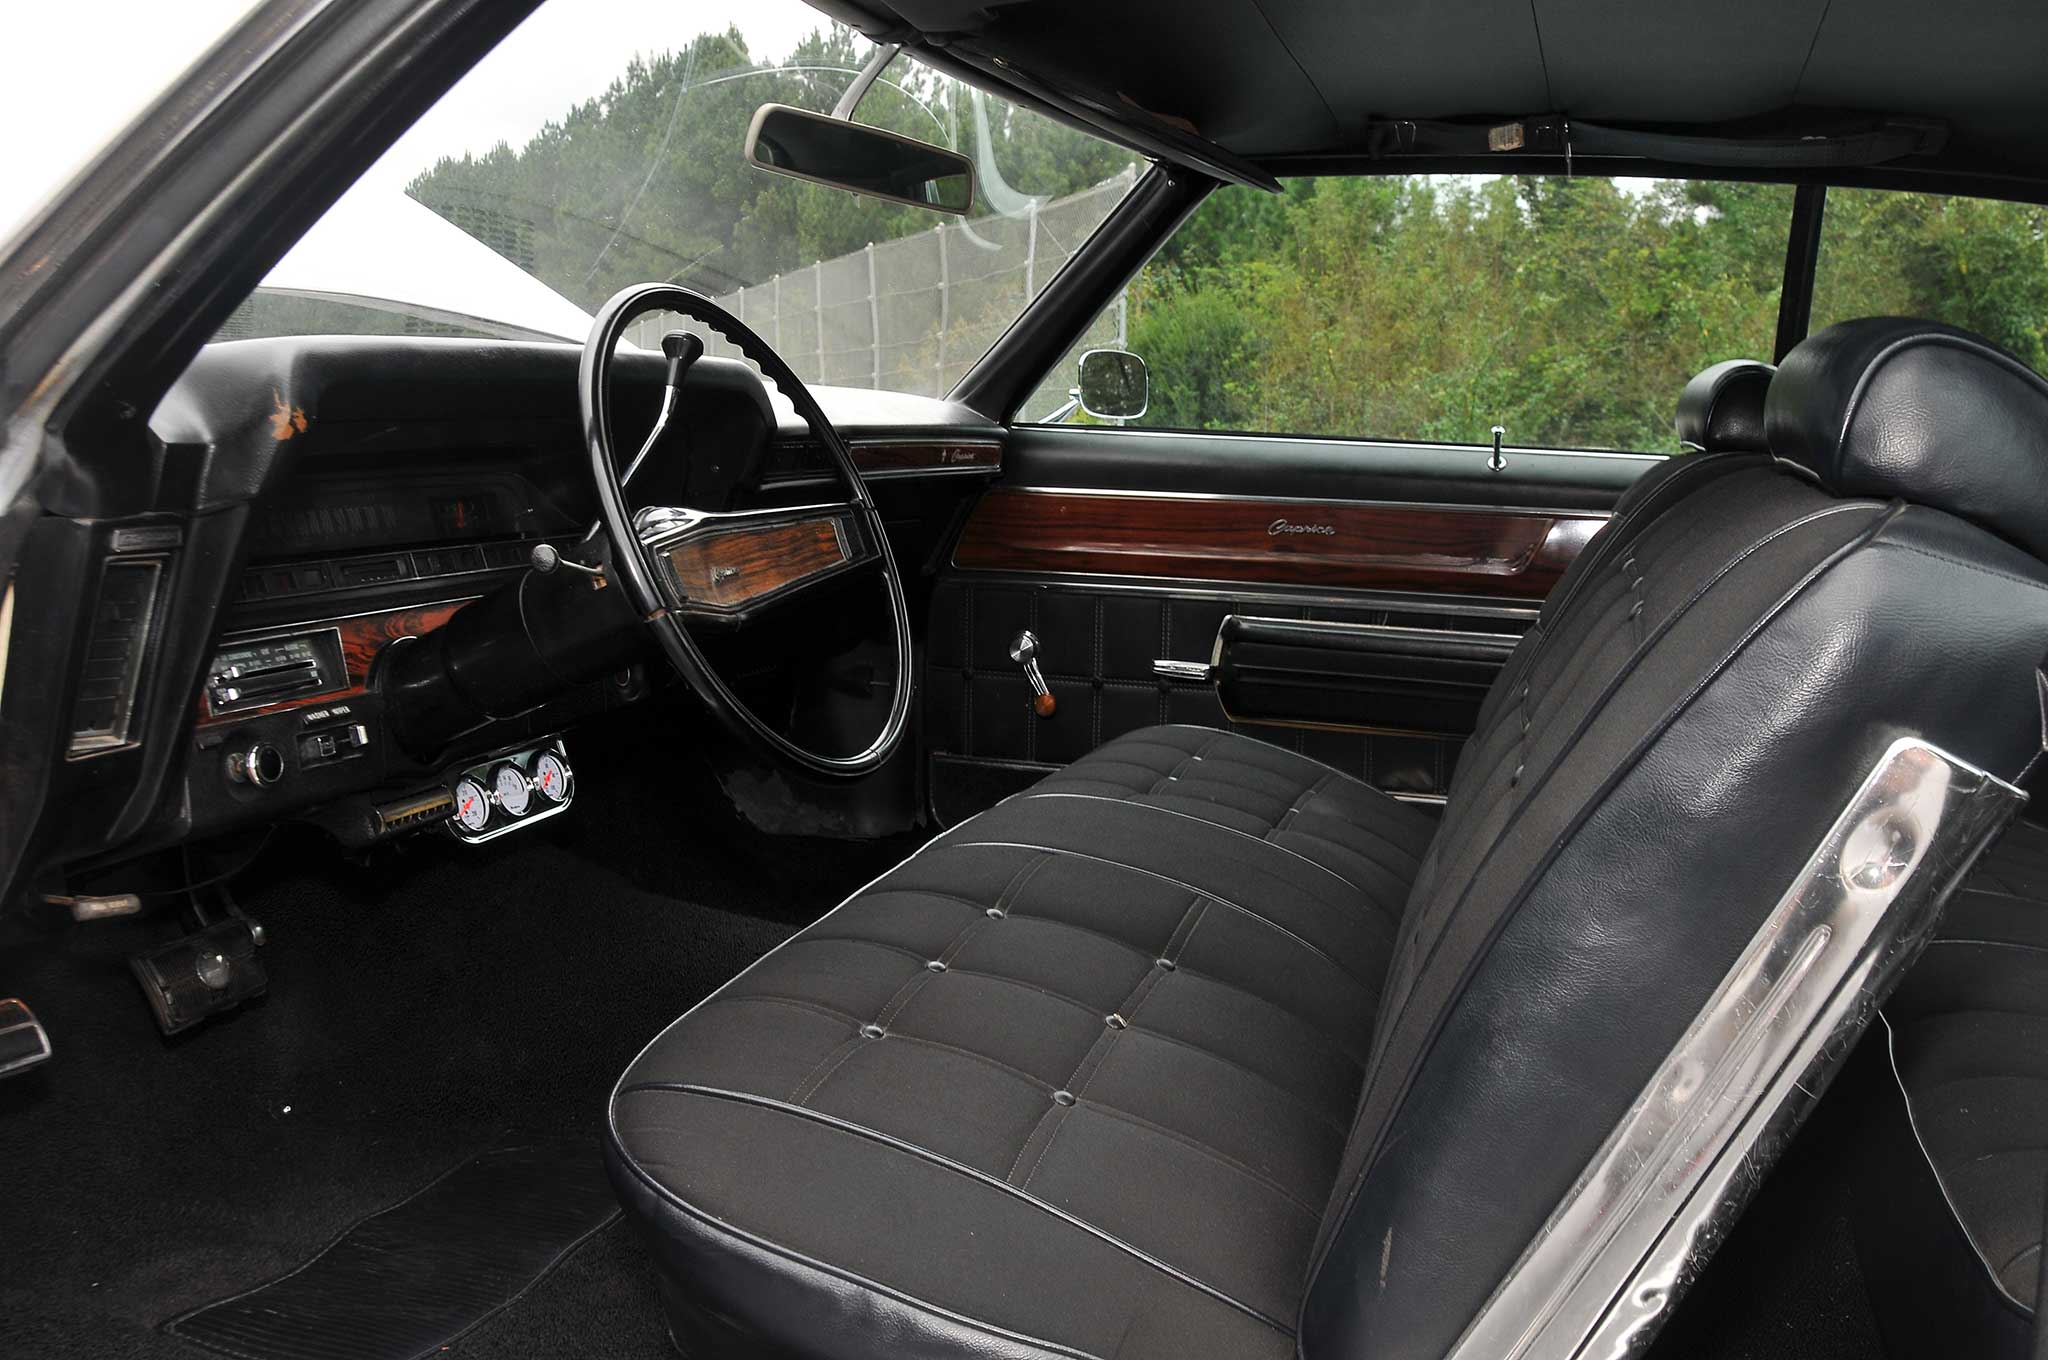 1970 Chevrolet Caprice Ocd Caprice Lowrider